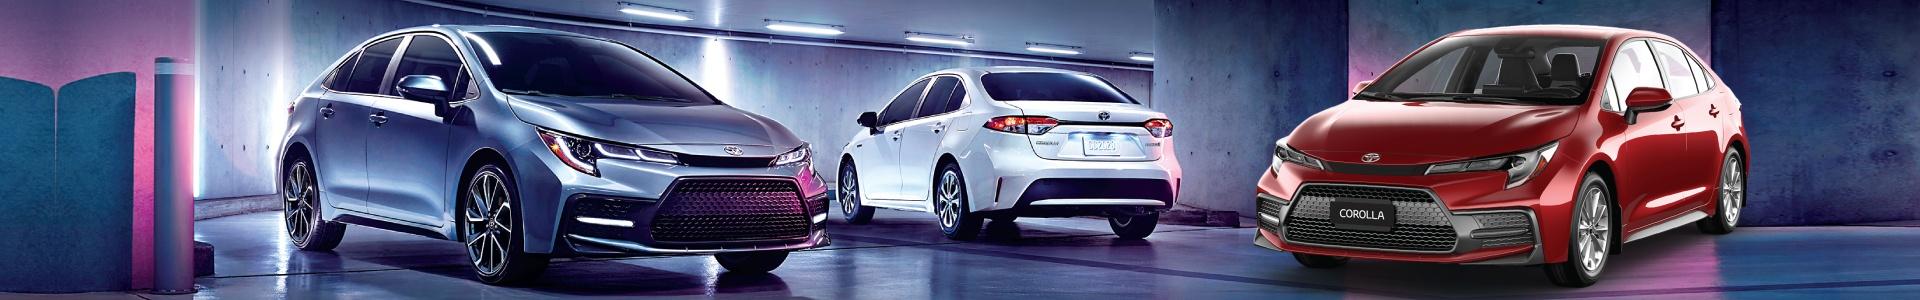 2020 Toyota Corolla Goderich